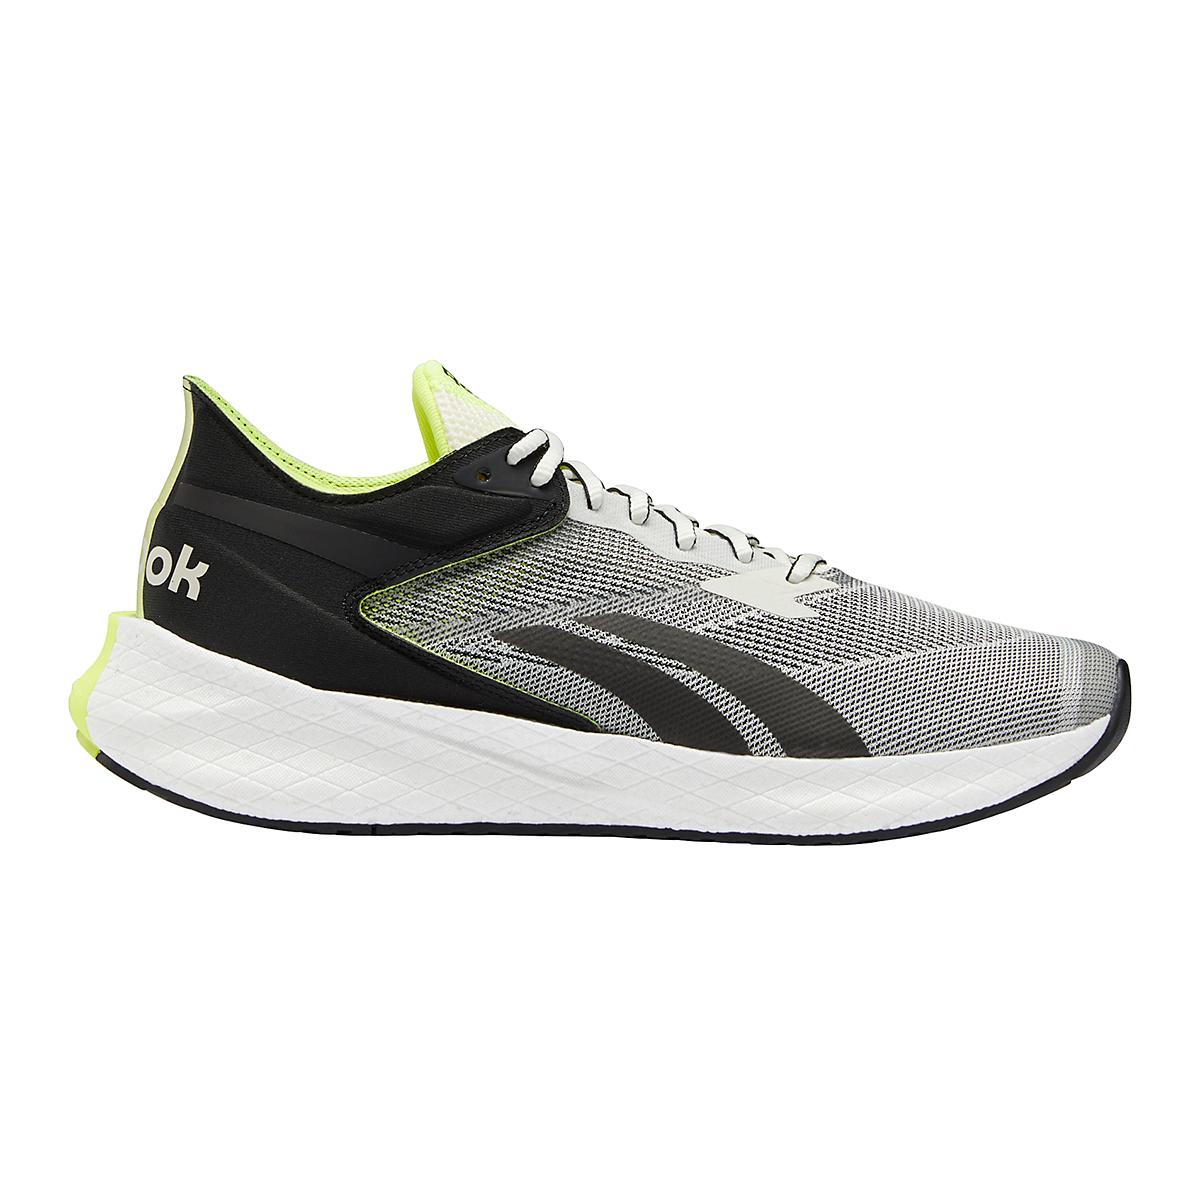 Men's Reebok Floatride Energy Symmetros Running Shoe - Color: Classic White/Core Black/Yellow Flare - Size: 7 - Width: Regular, Classic White/Core Black/Yellow Flare, large, image 1